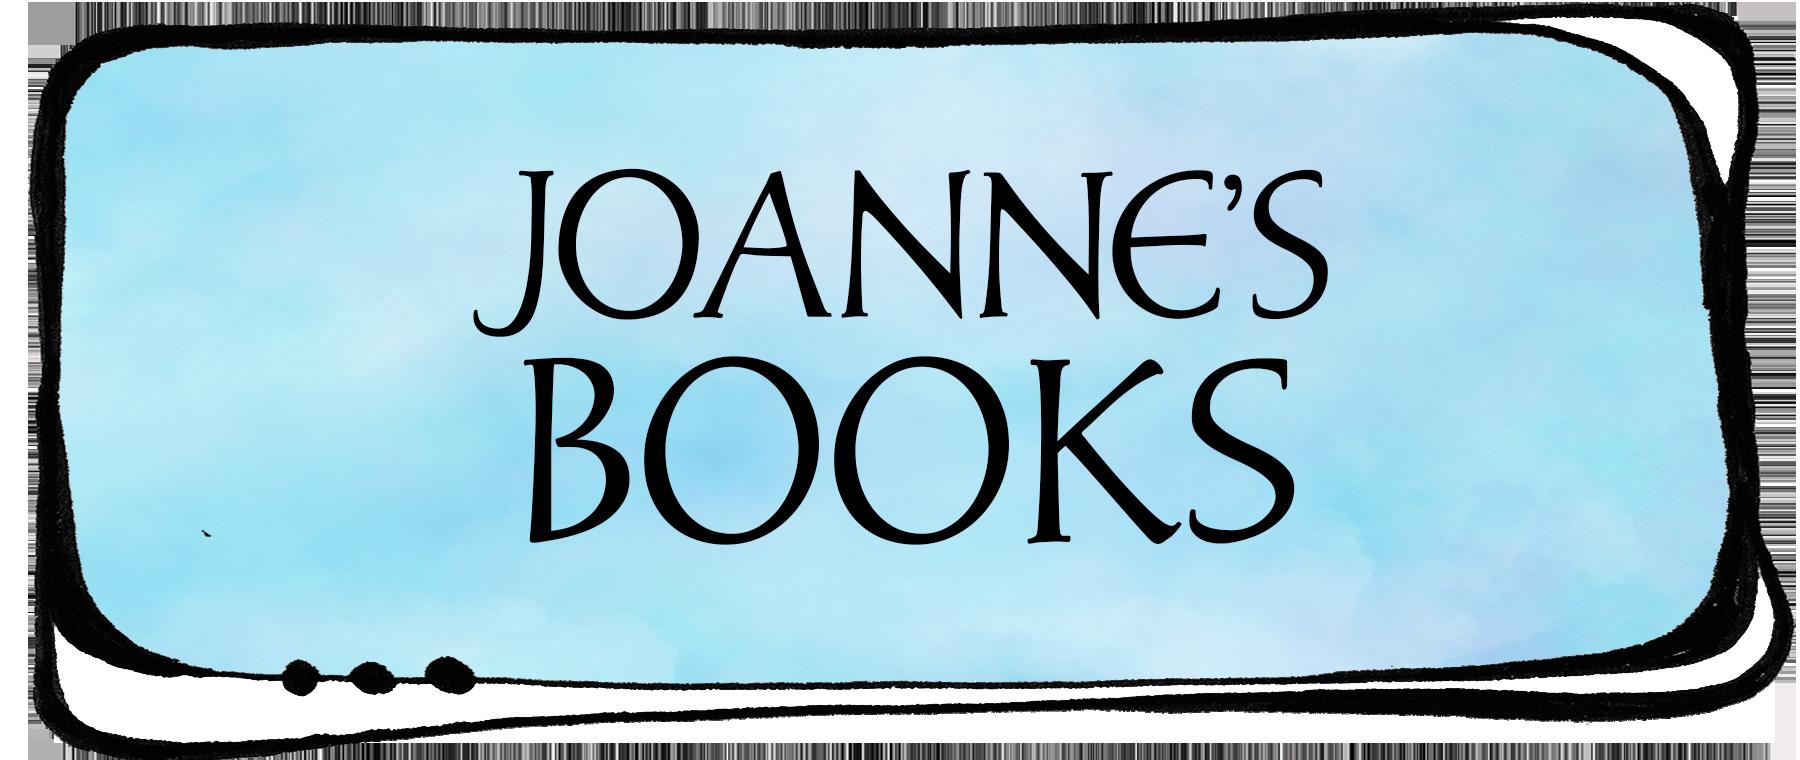 Joanne's Books